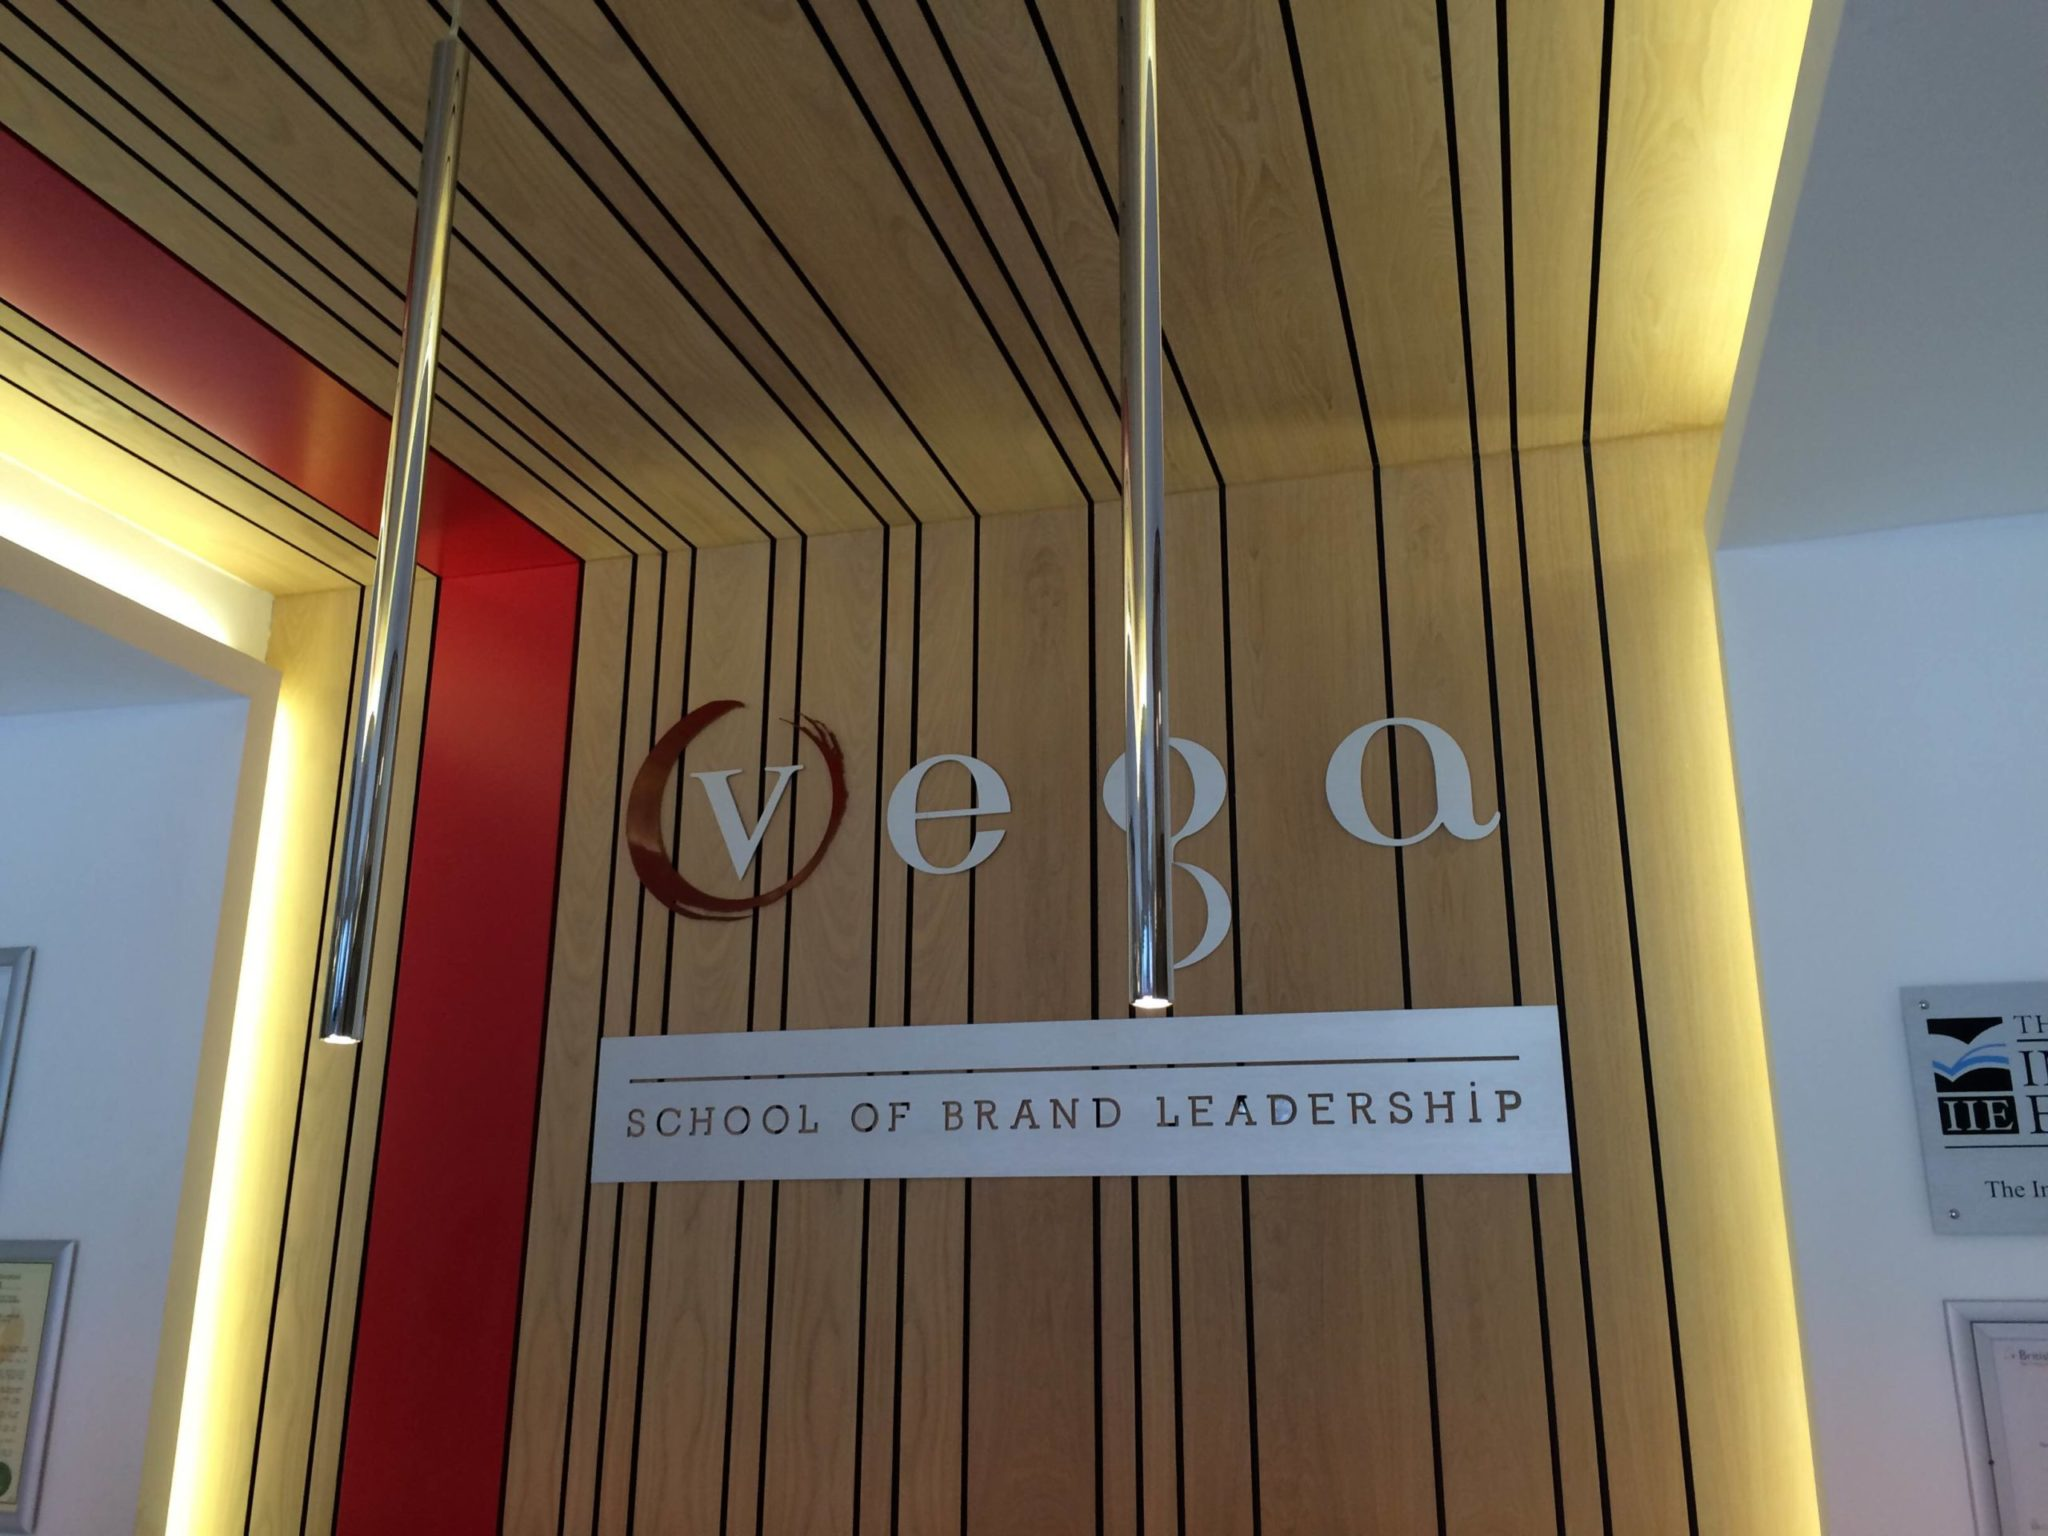 Vega – School of Brand Leadership